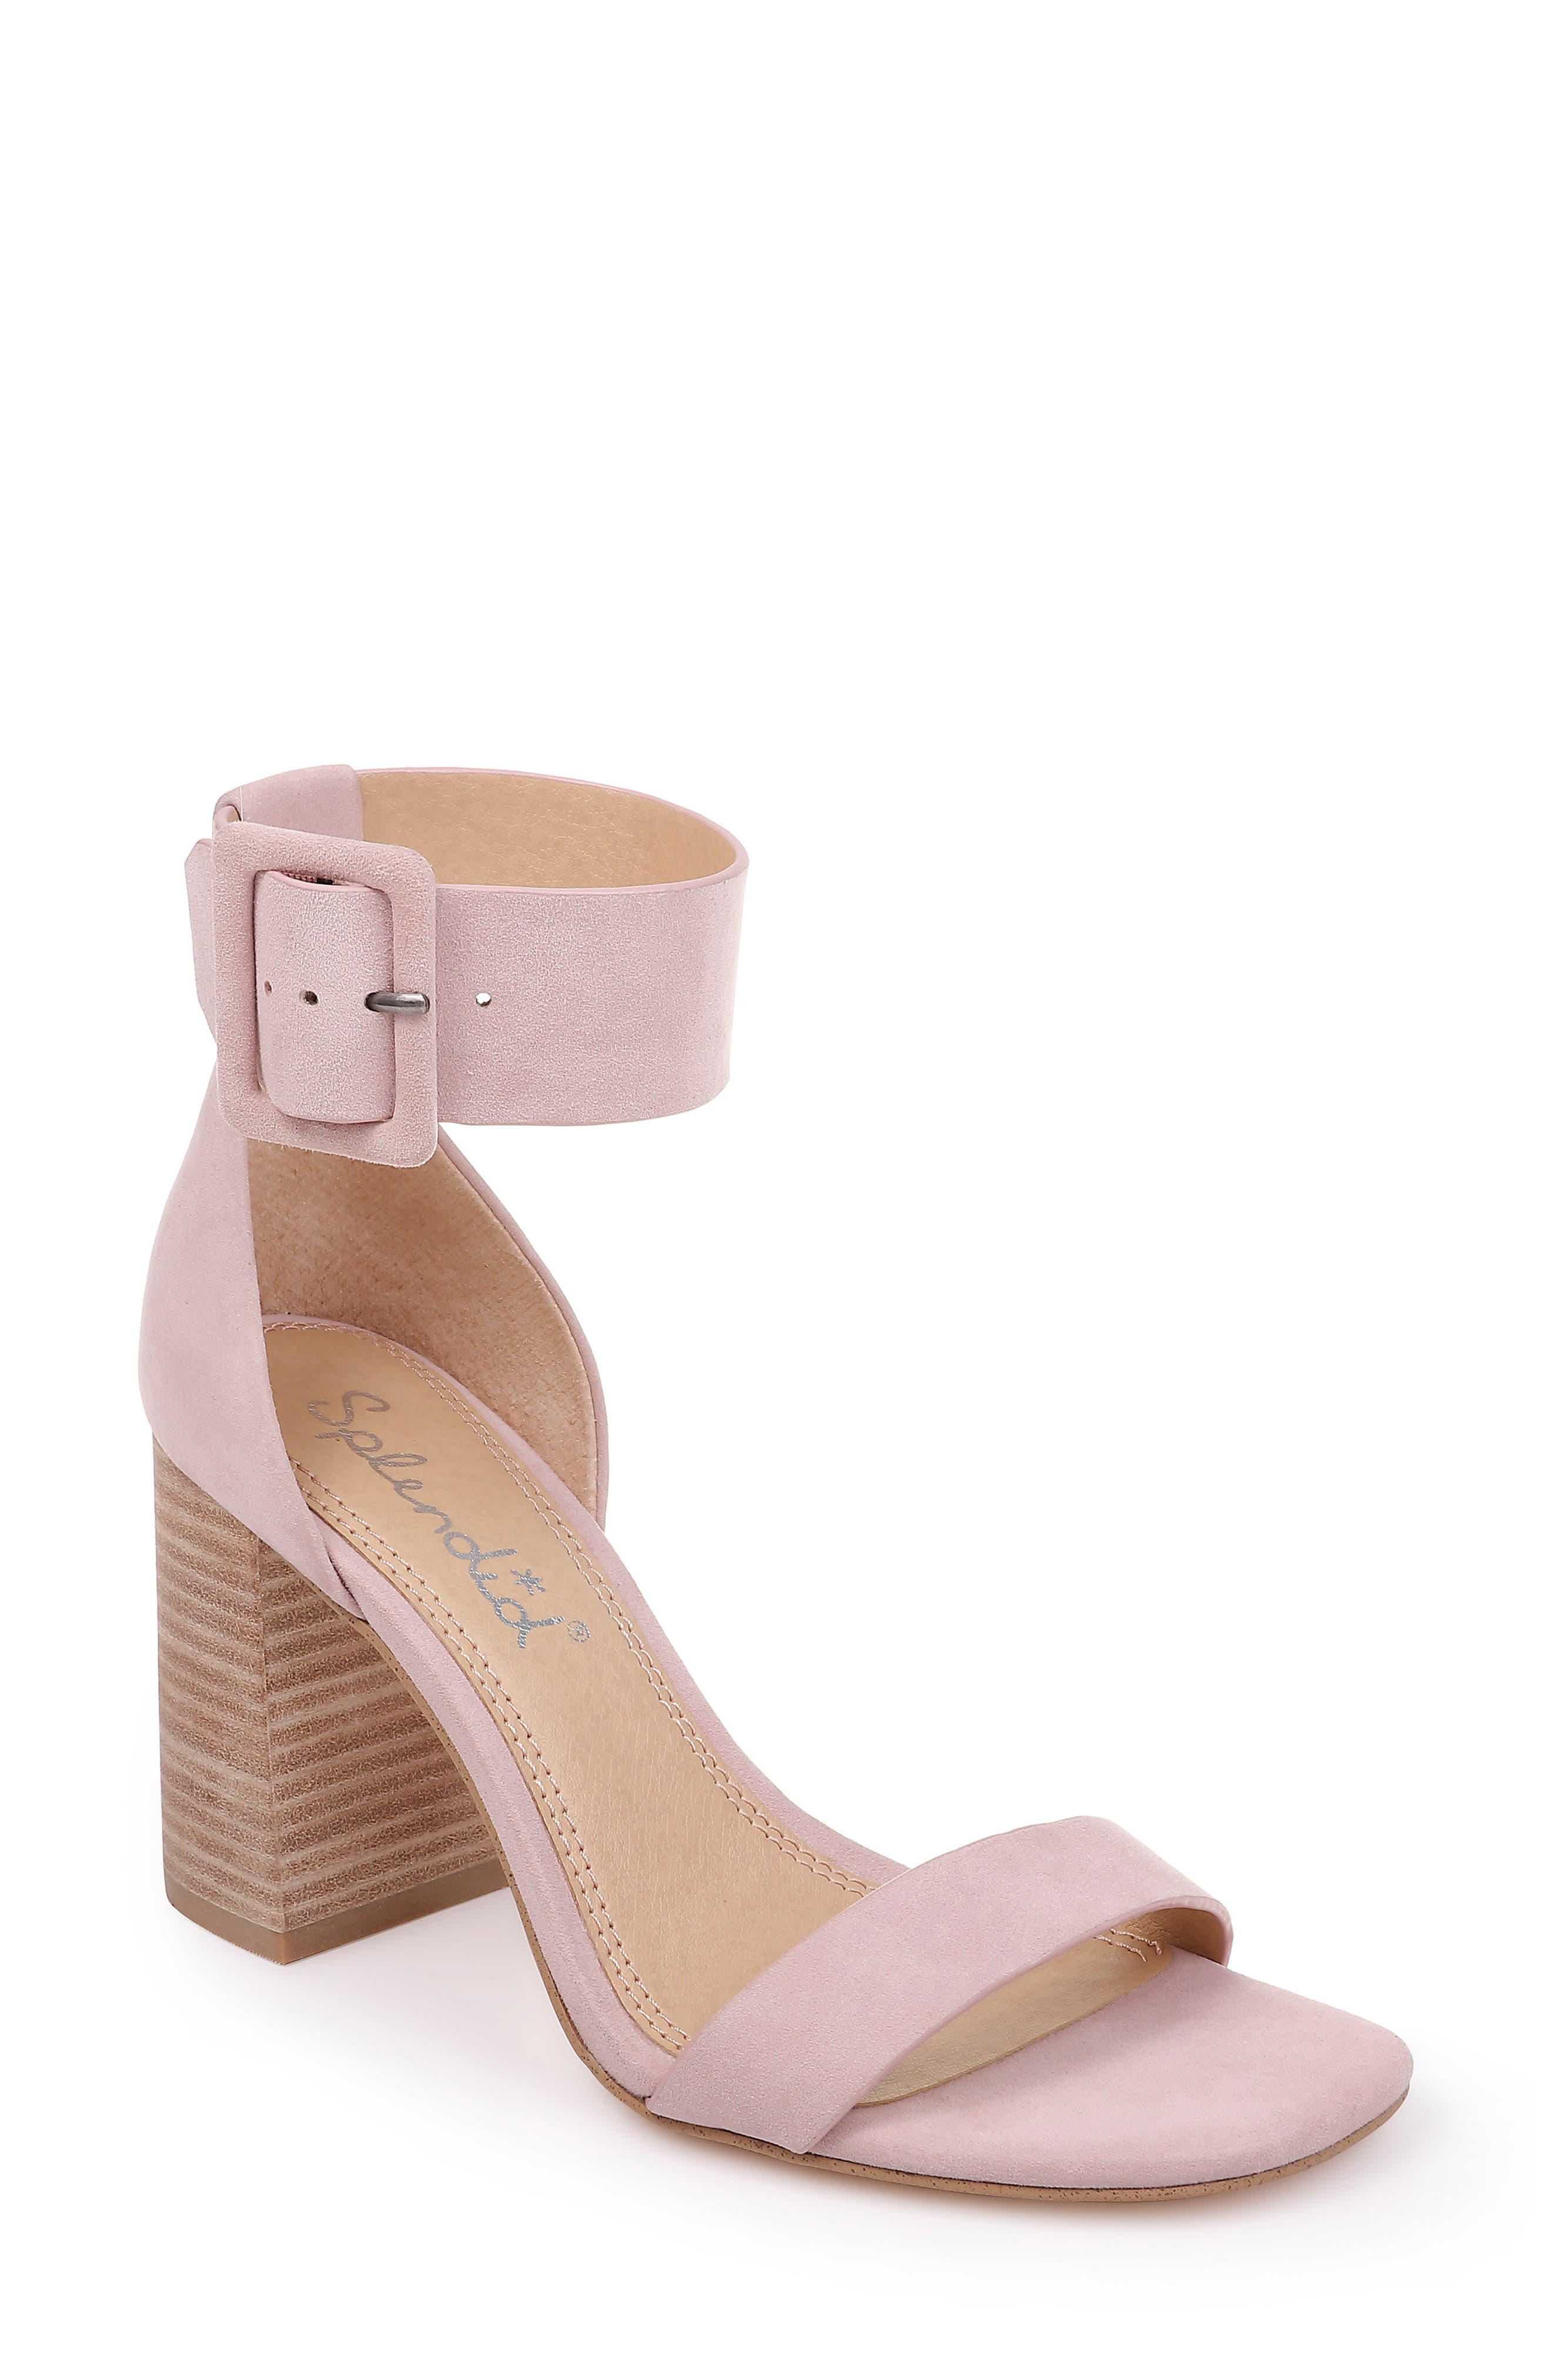 77396ce10471 Splendid Block Heel Sandal- Pink